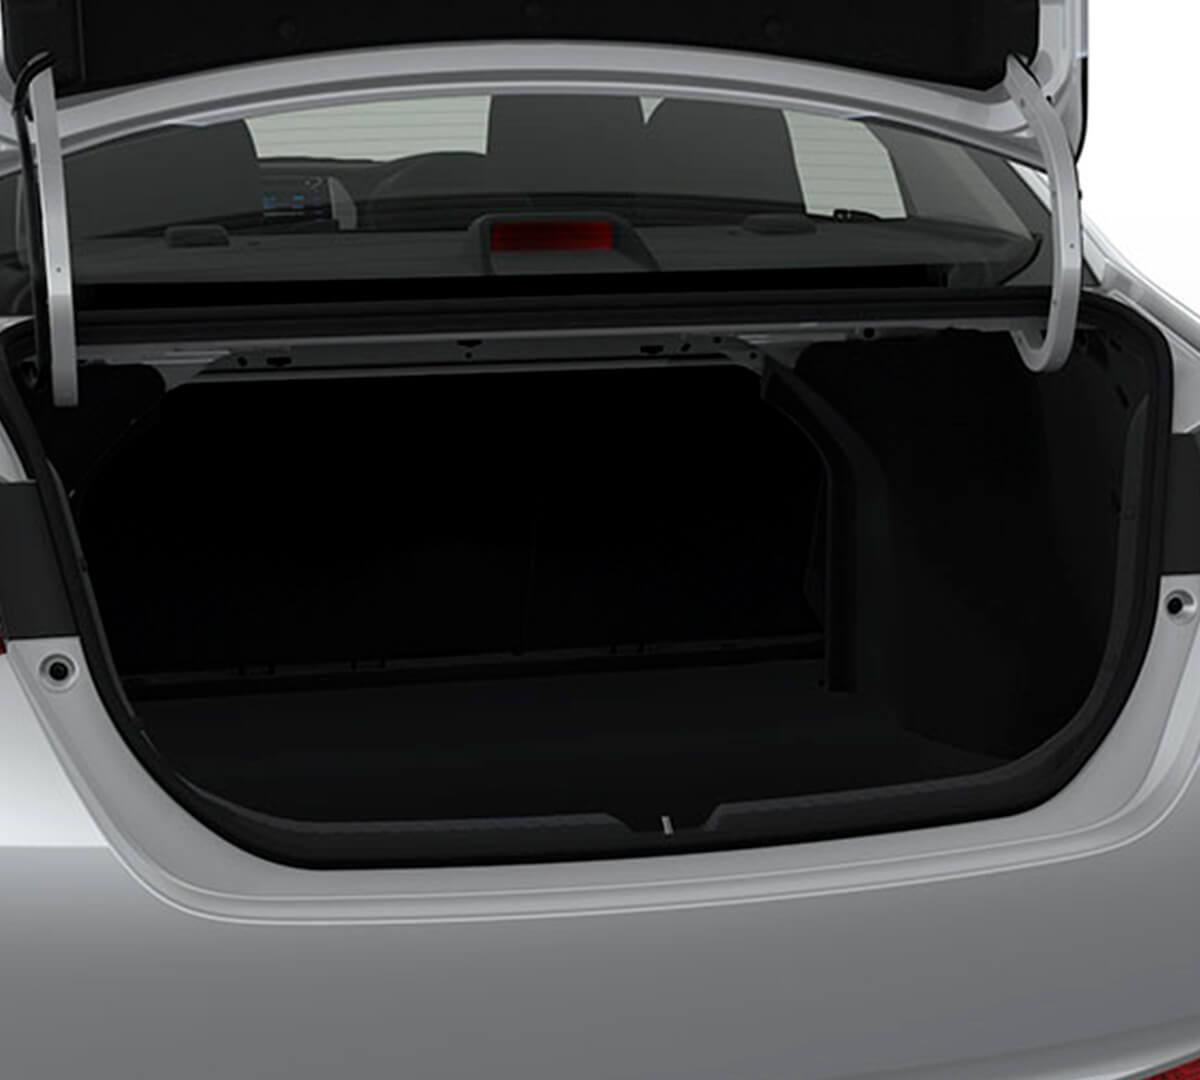 Maletero del auto Toyota Yaris 2021- 2022